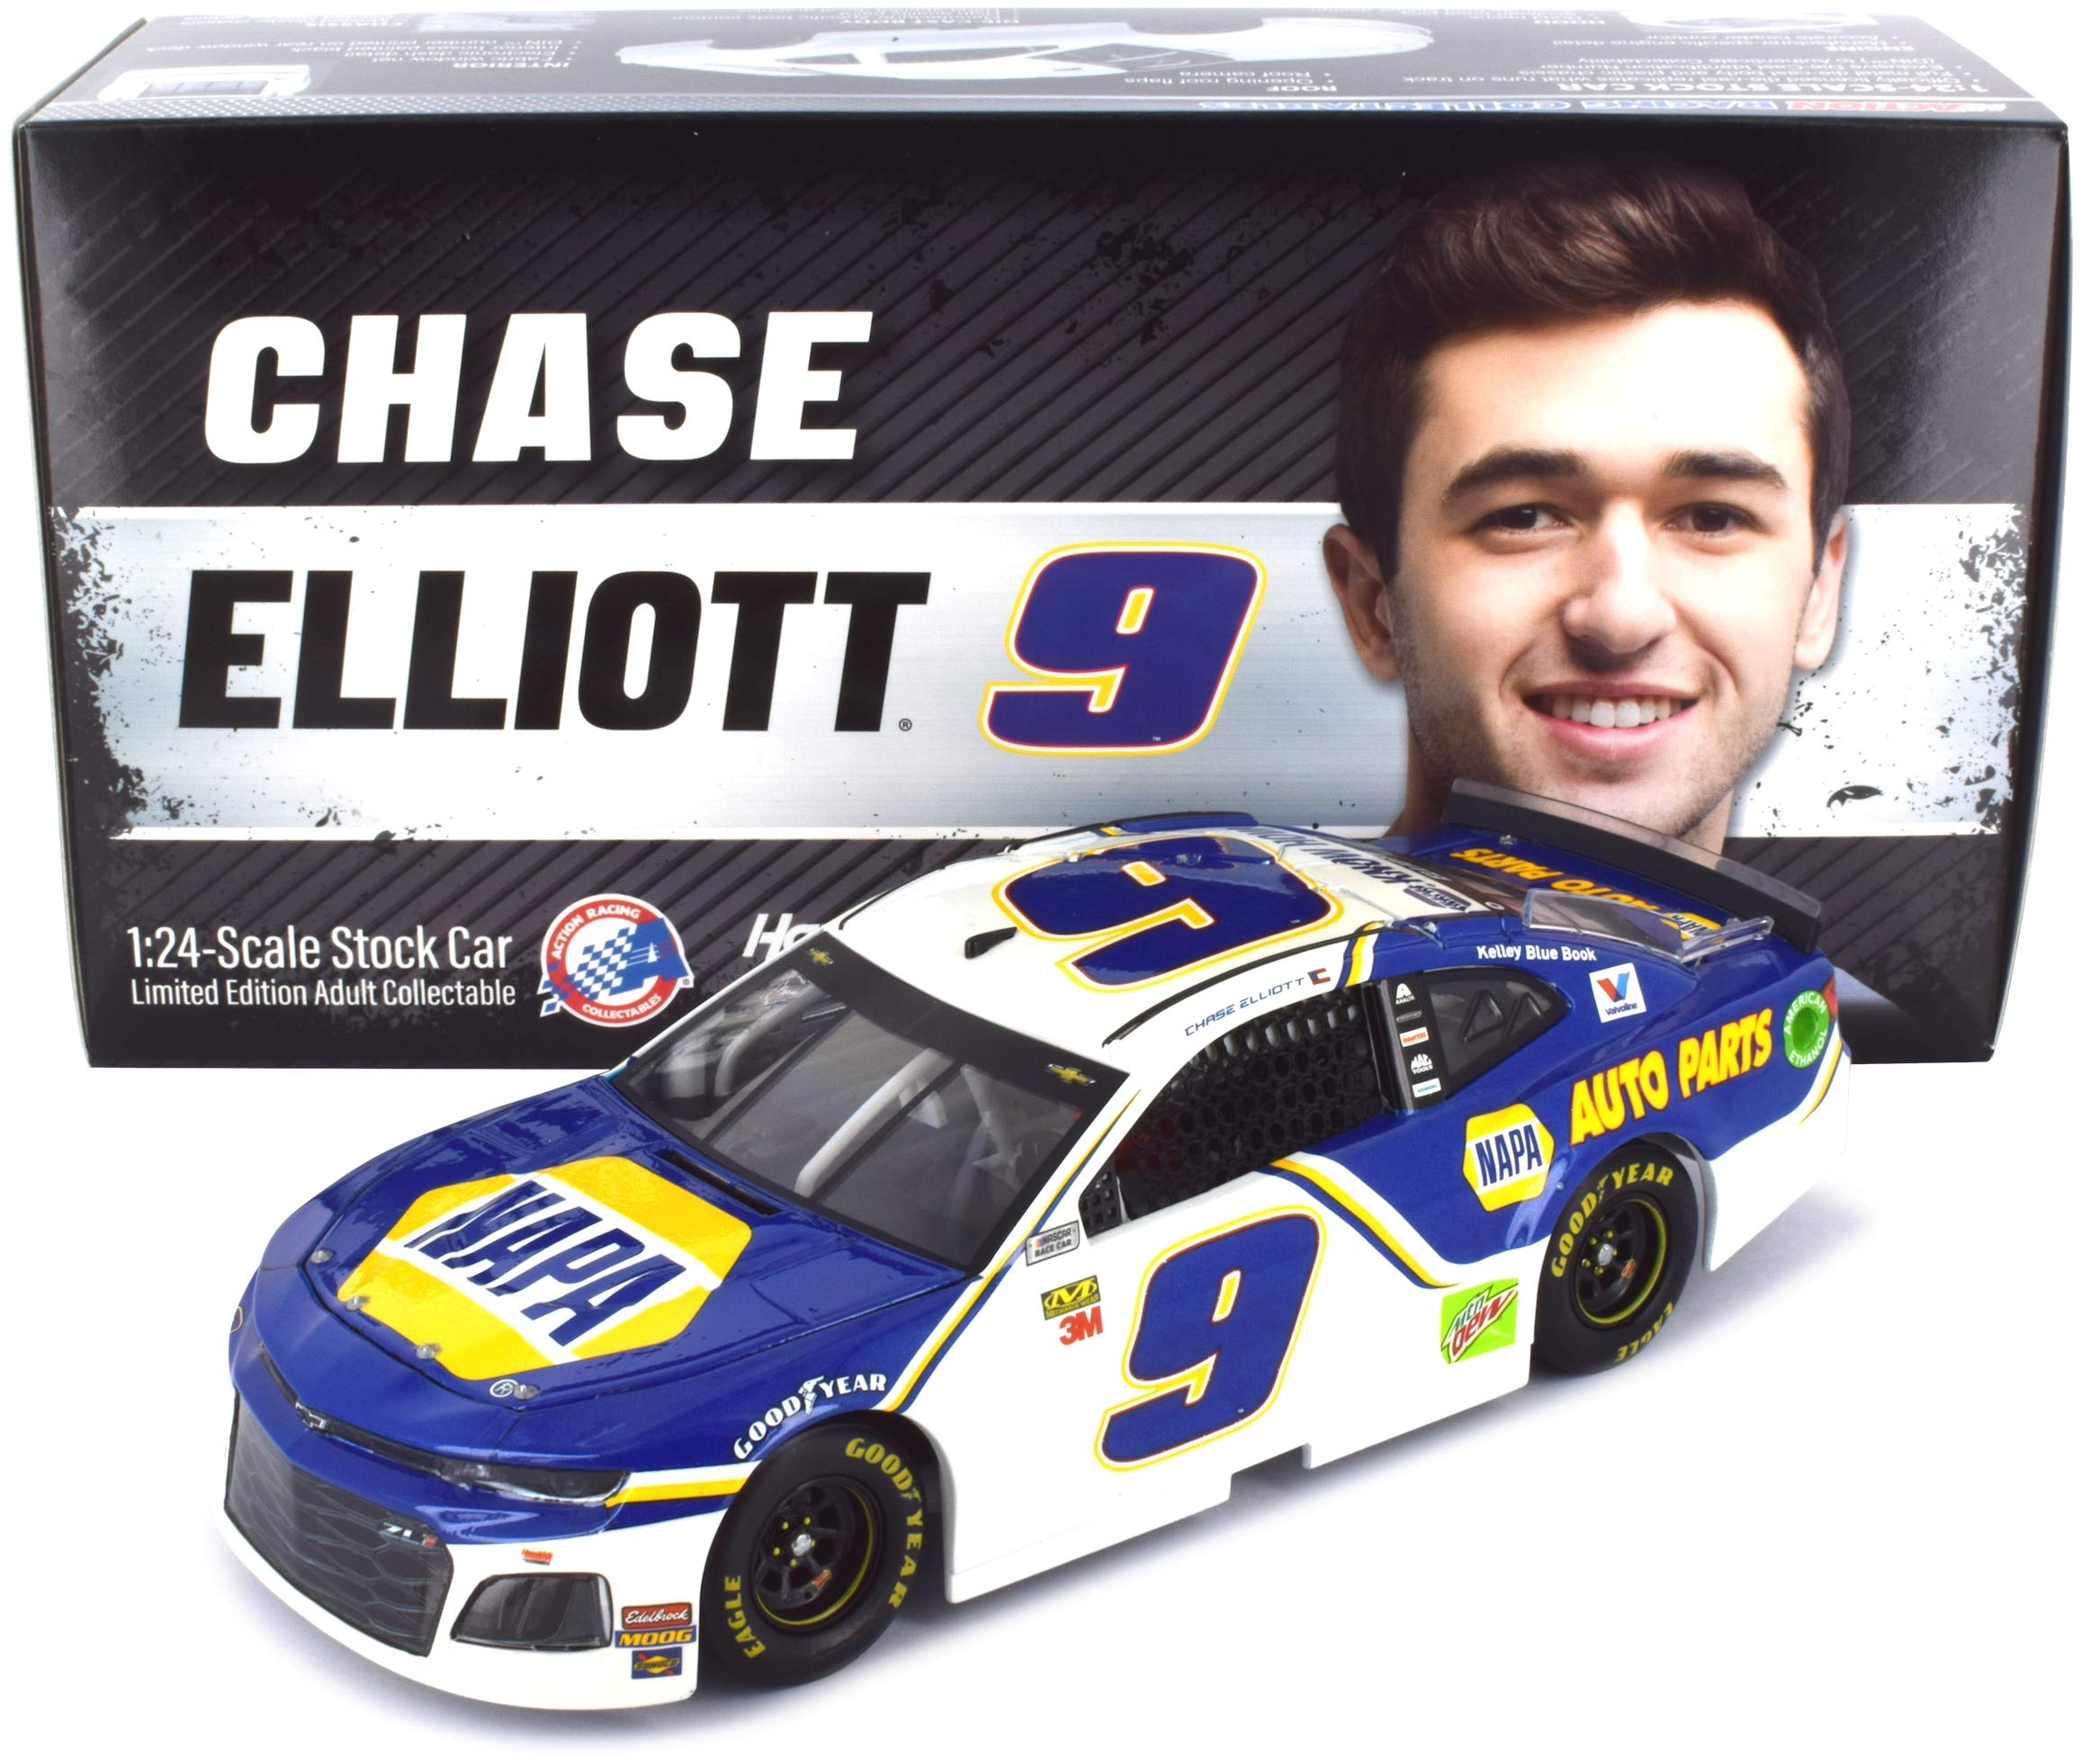 Lionel Racing Chase Elliott #9 NAPA 2019 Chevrolet Camaro NASCAR Diecast 1:24 Scale